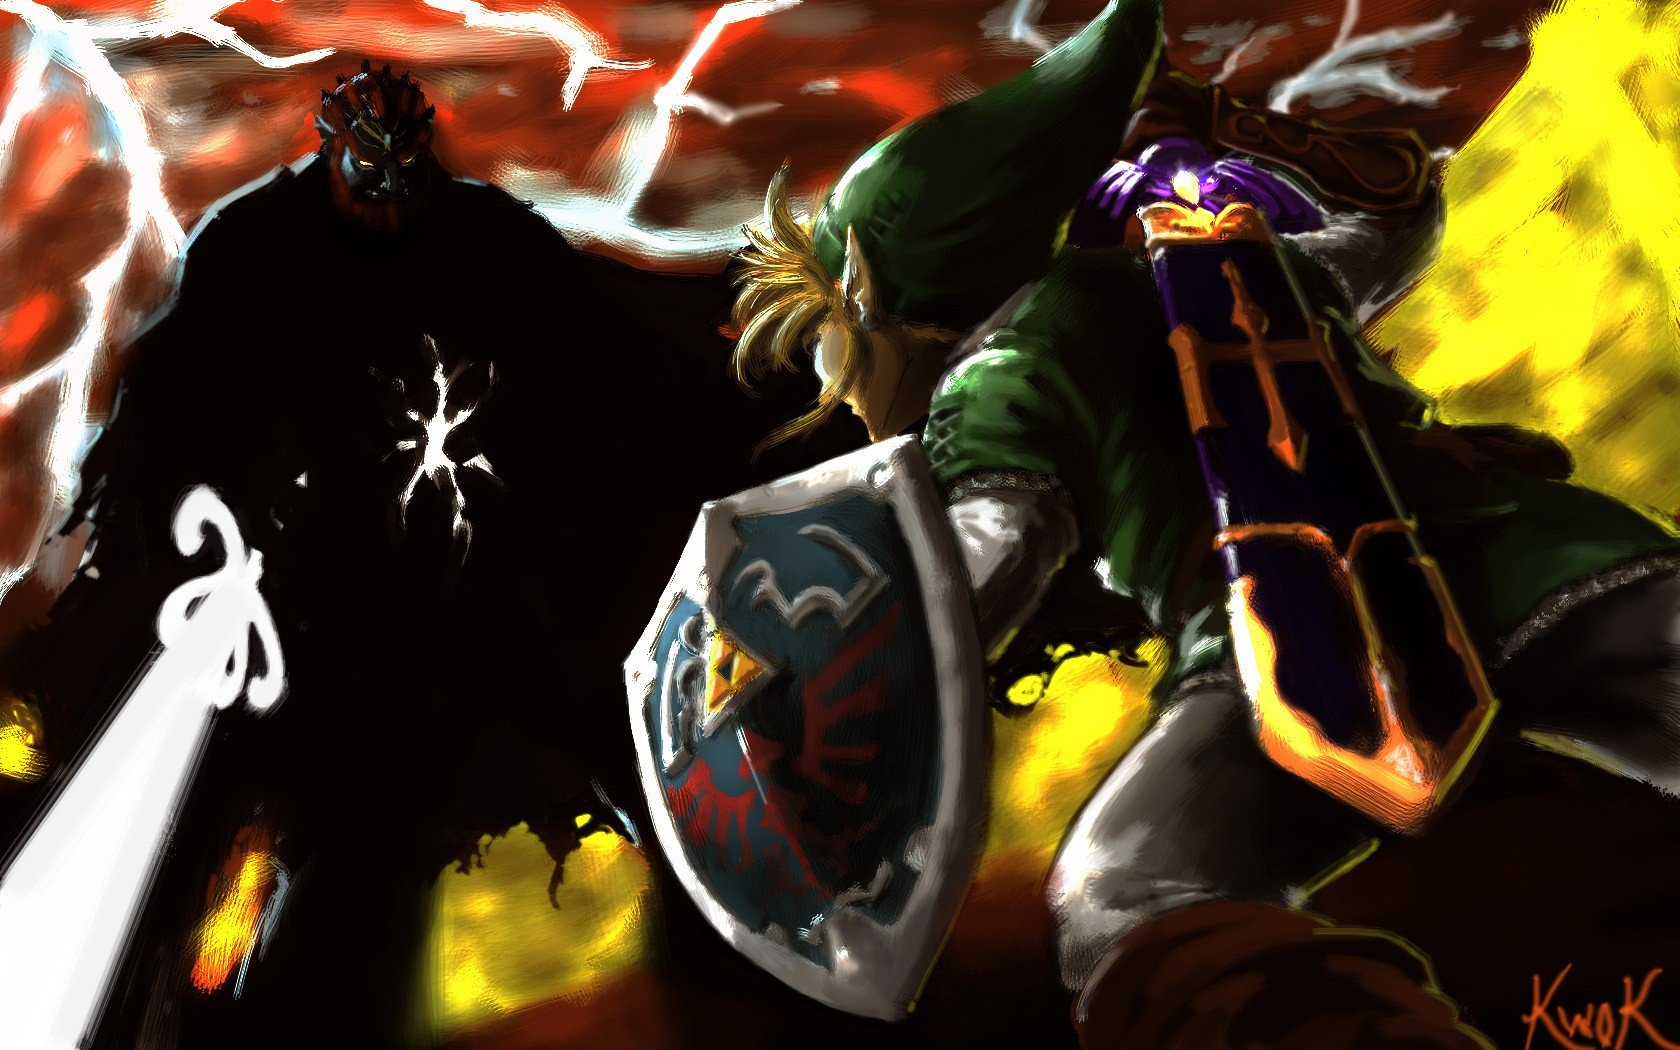 Link Ganondorf Wallpaper And Background Jpg 298 Kb Link Vs